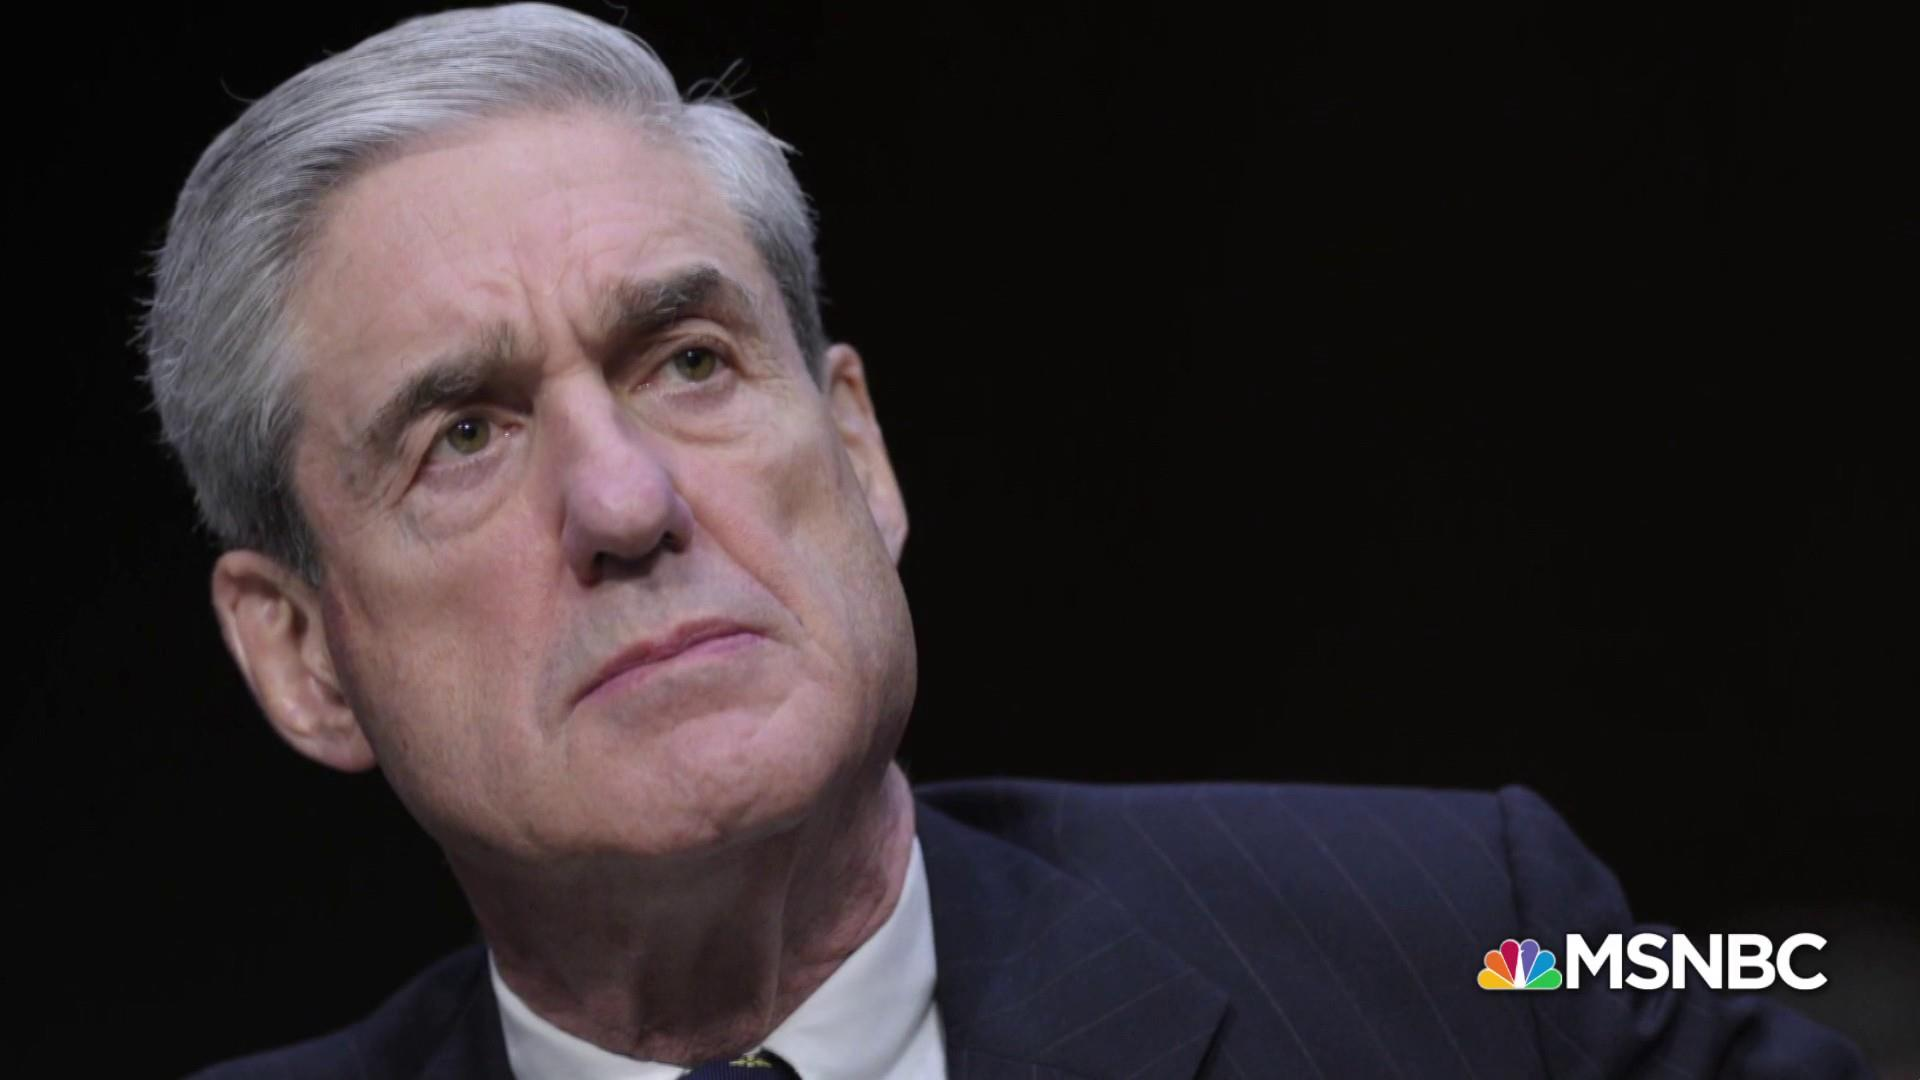 Trump faces at least 17 separate investigations